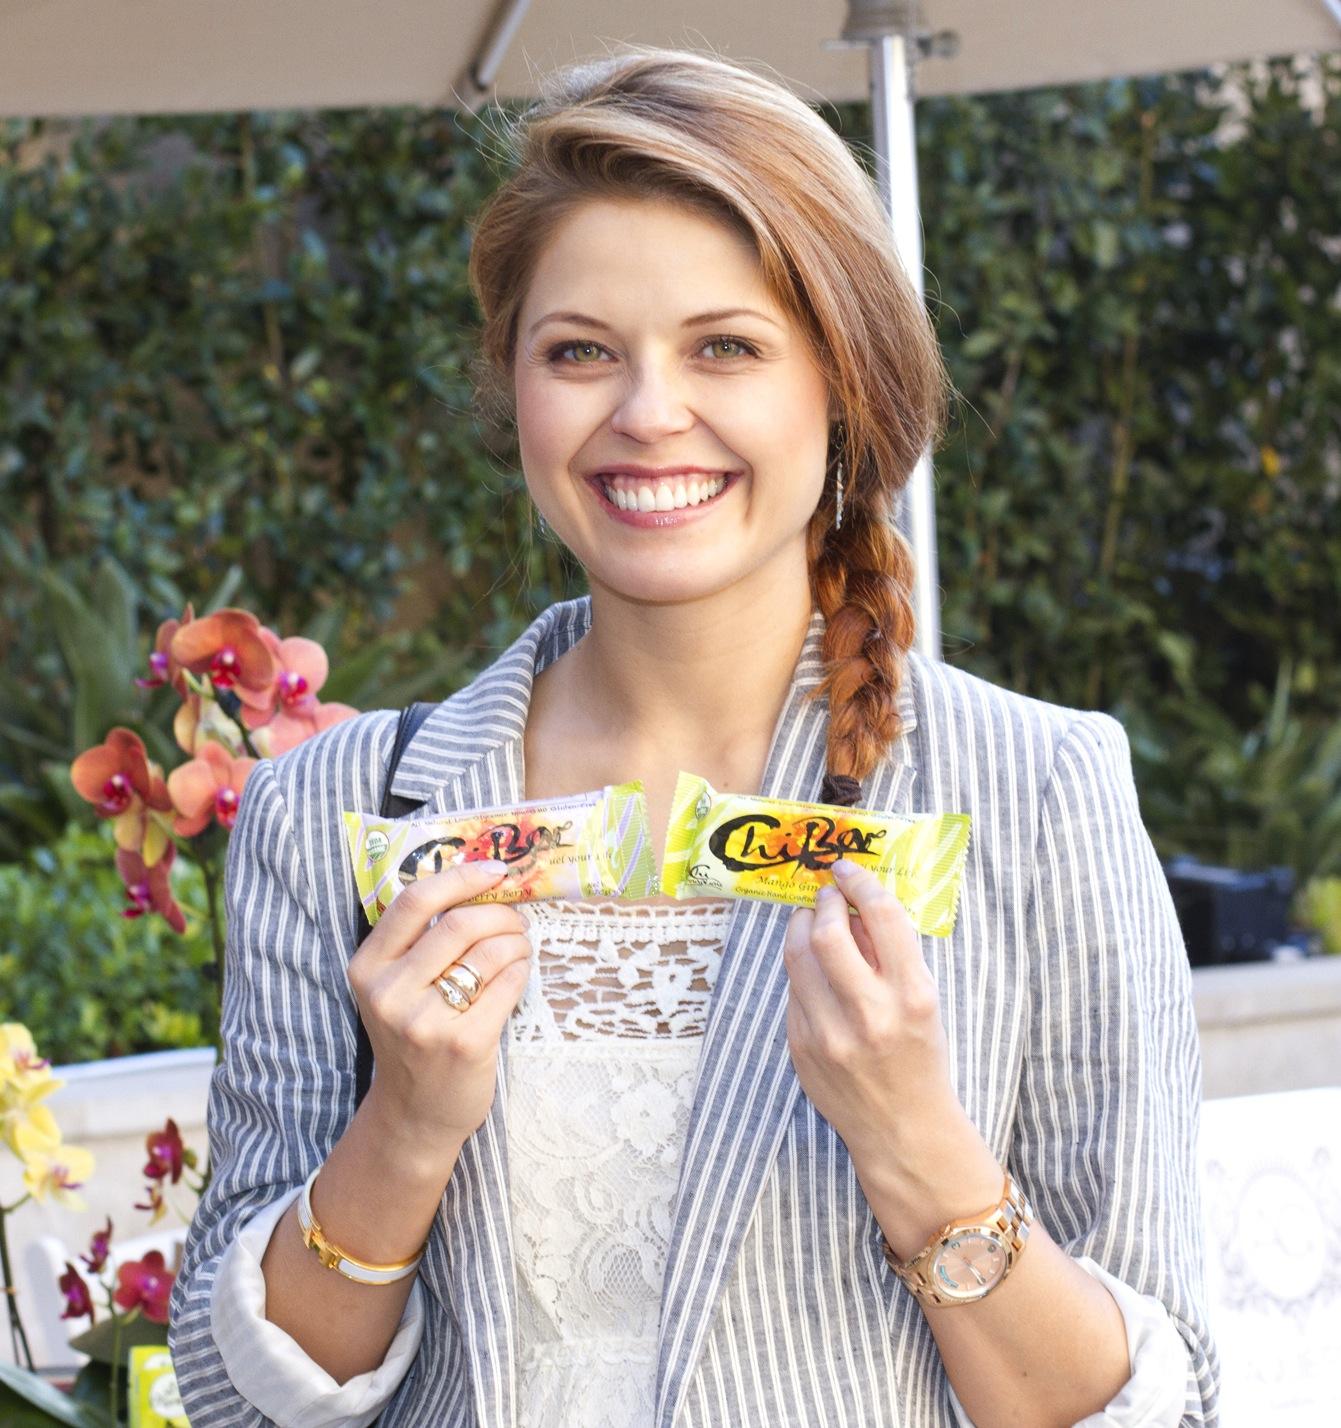 Anna Trebunskaya & ChiBar.jpg